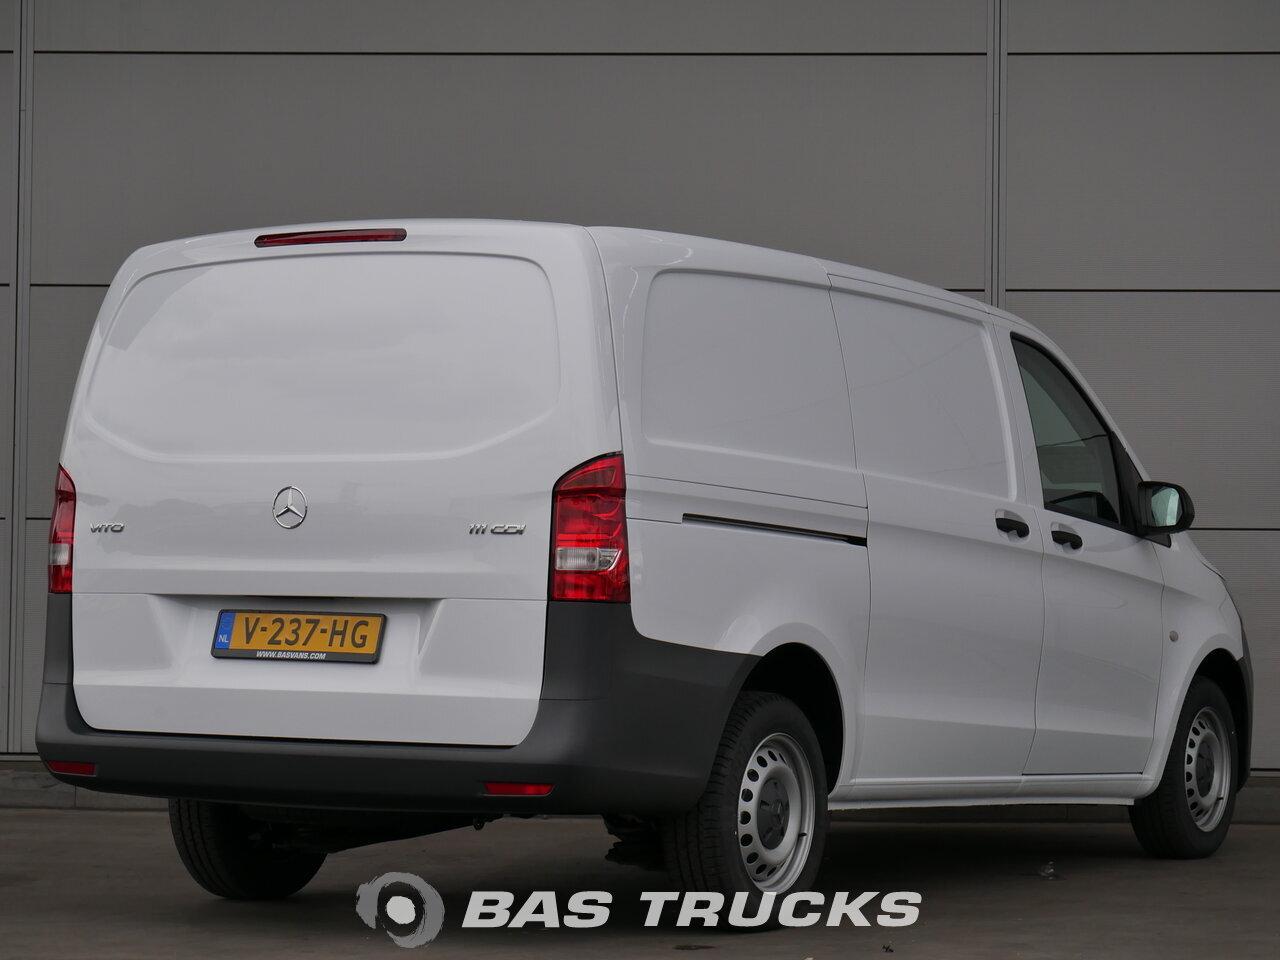 mercedes vito leichte nutzfahrzeuge euro 0 17400 bas trucks. Black Bedroom Furniture Sets. Home Design Ideas